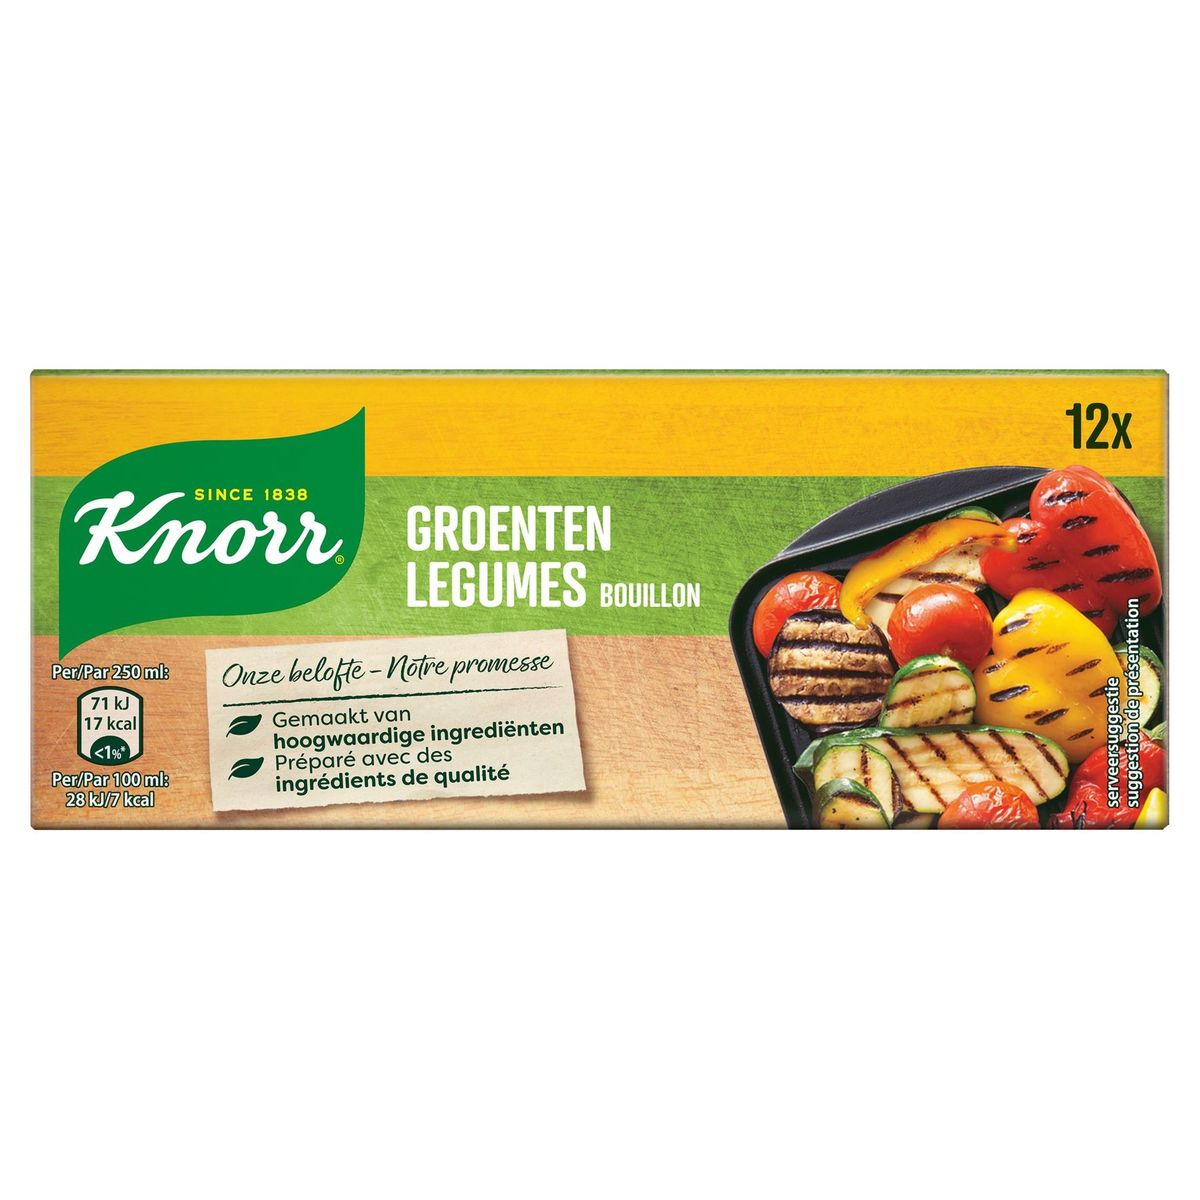 Knorr Original Bouillon Groenten 12 Bouillonblokjes 12 x 10 g